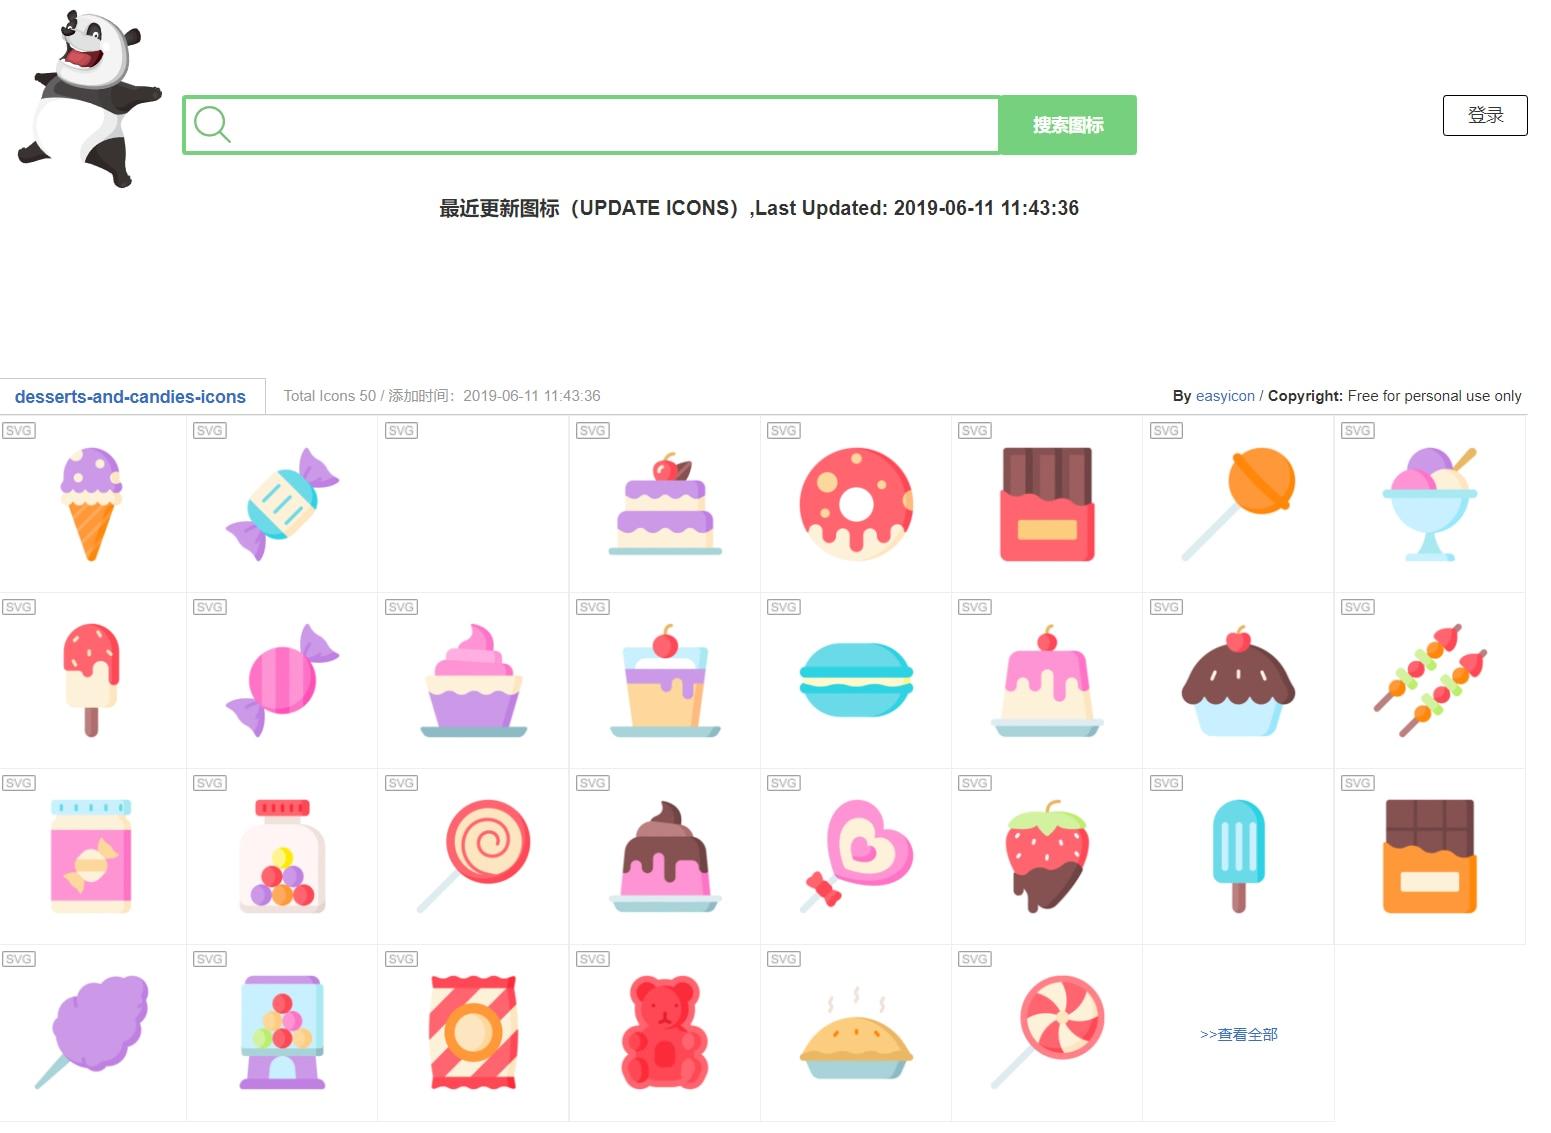 专门下载图标的网站 easyicon